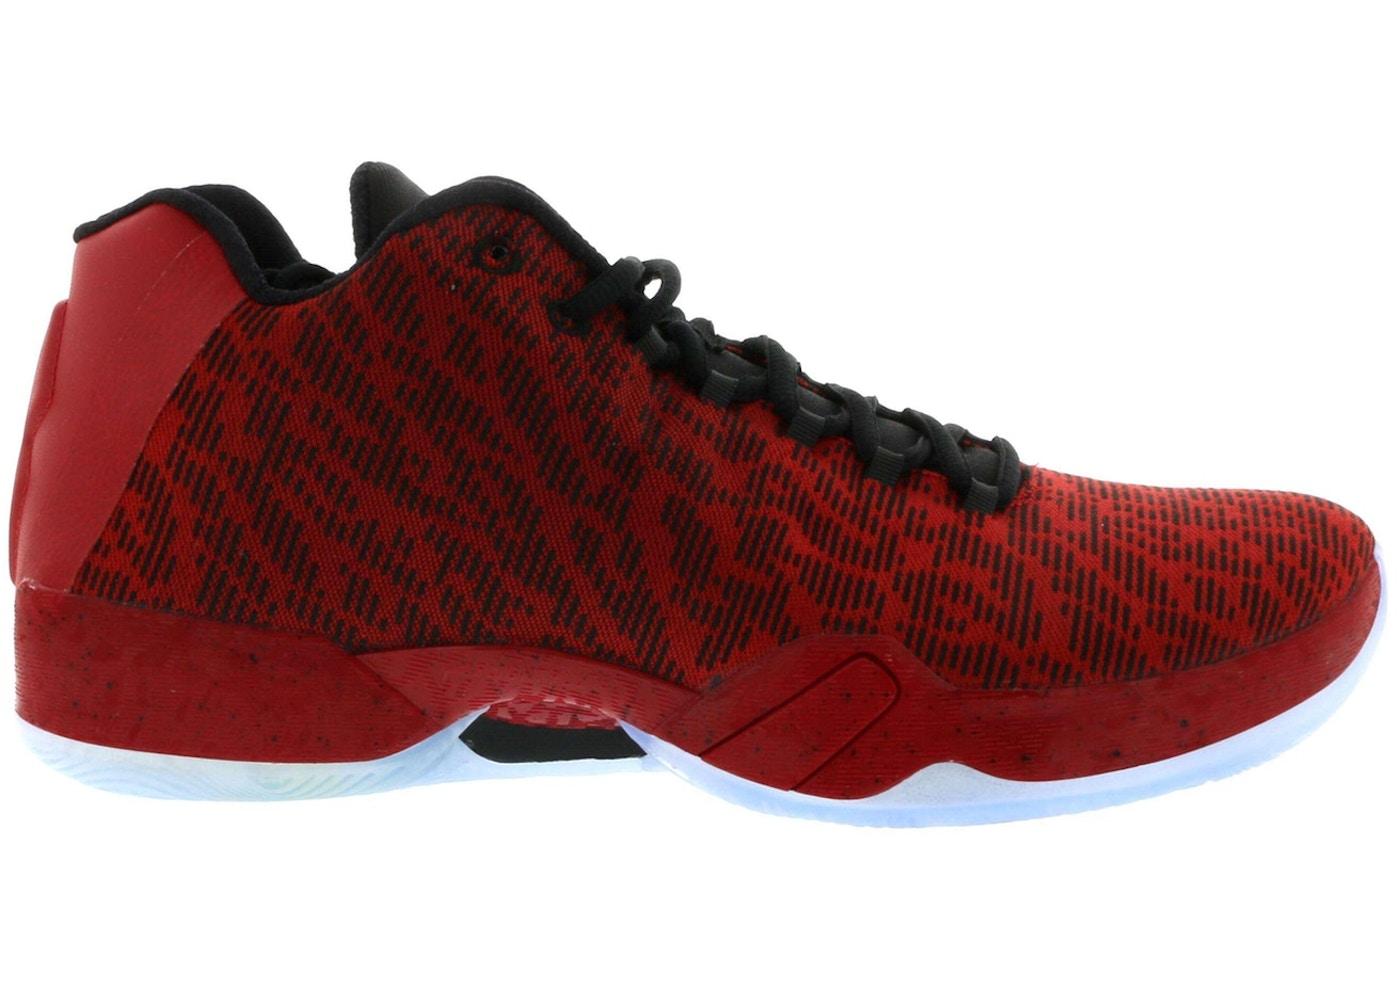 the best attitude d5500 209a3 Buy Air Jordan 29 Shoes & Deadstock Sneakers